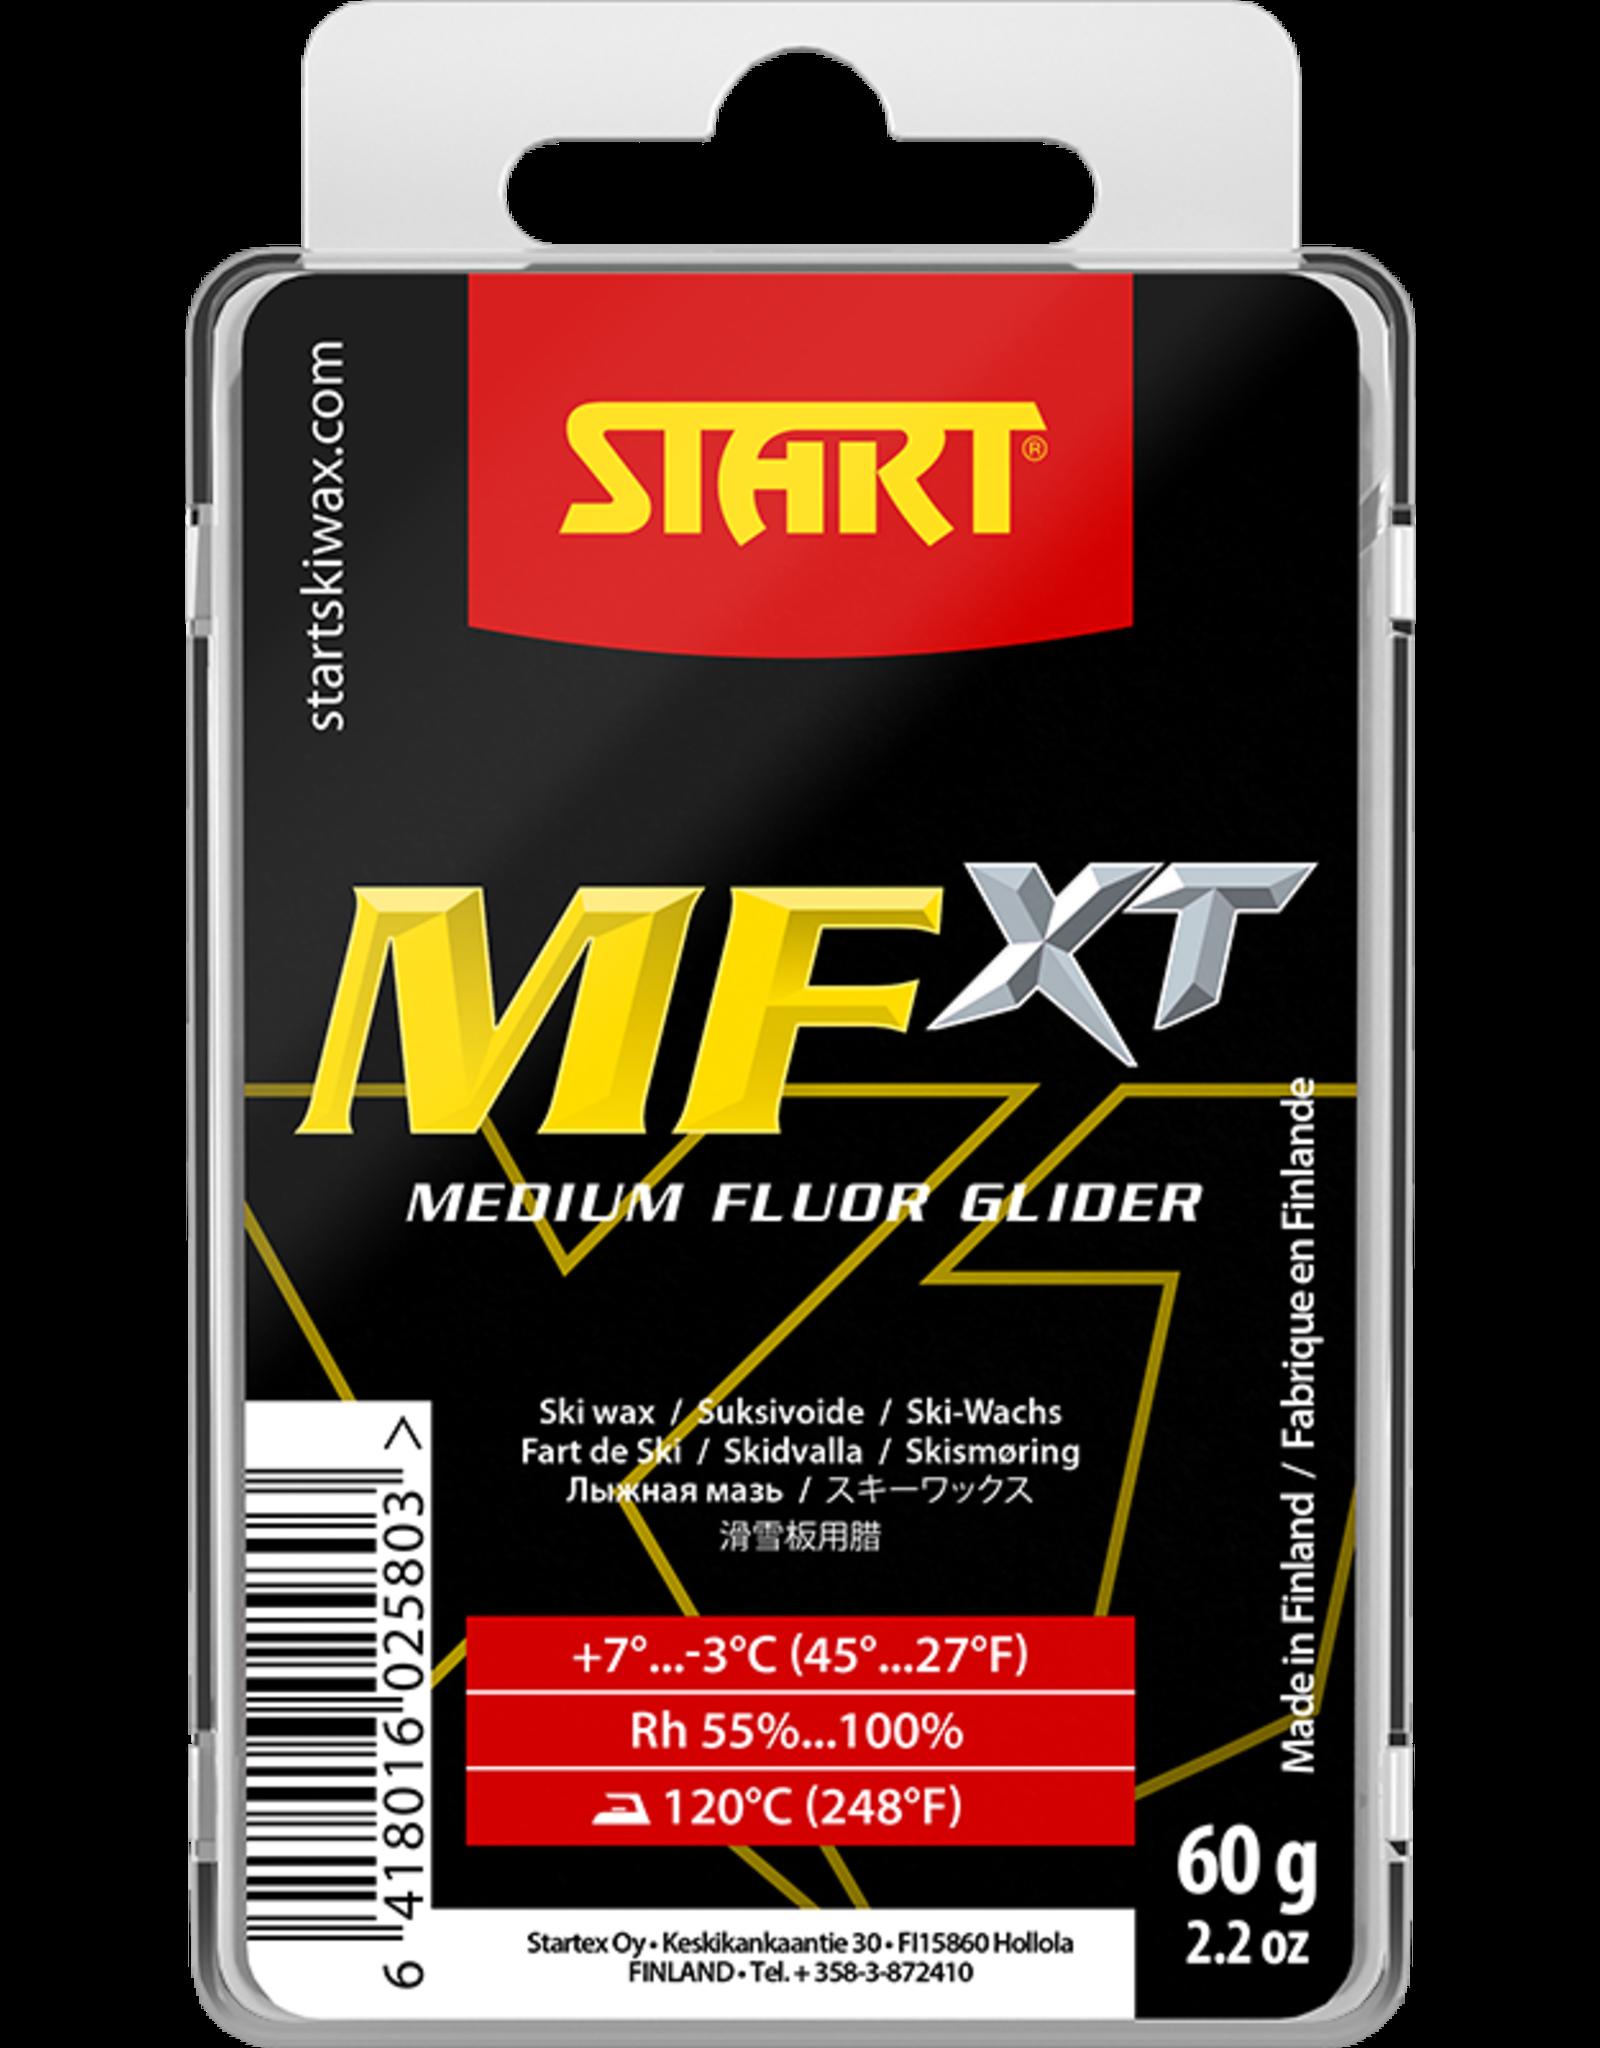 Start MFXT Red Fluor Glider 180g